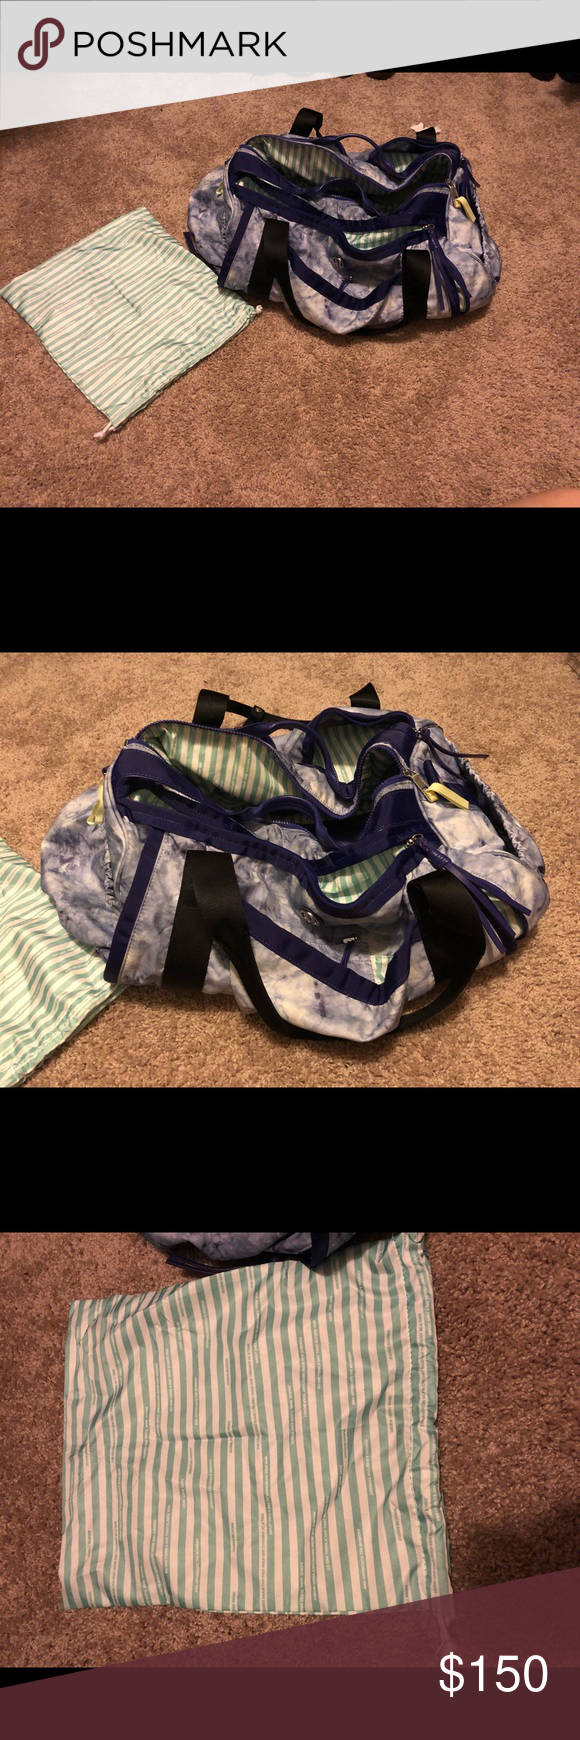 e16316d6c255 LuLu Lemon tie dye Gym Bag LuLu Lemon Tie dye gym bag with small garment bag.  Few marks on bottoms from being placed on ground.